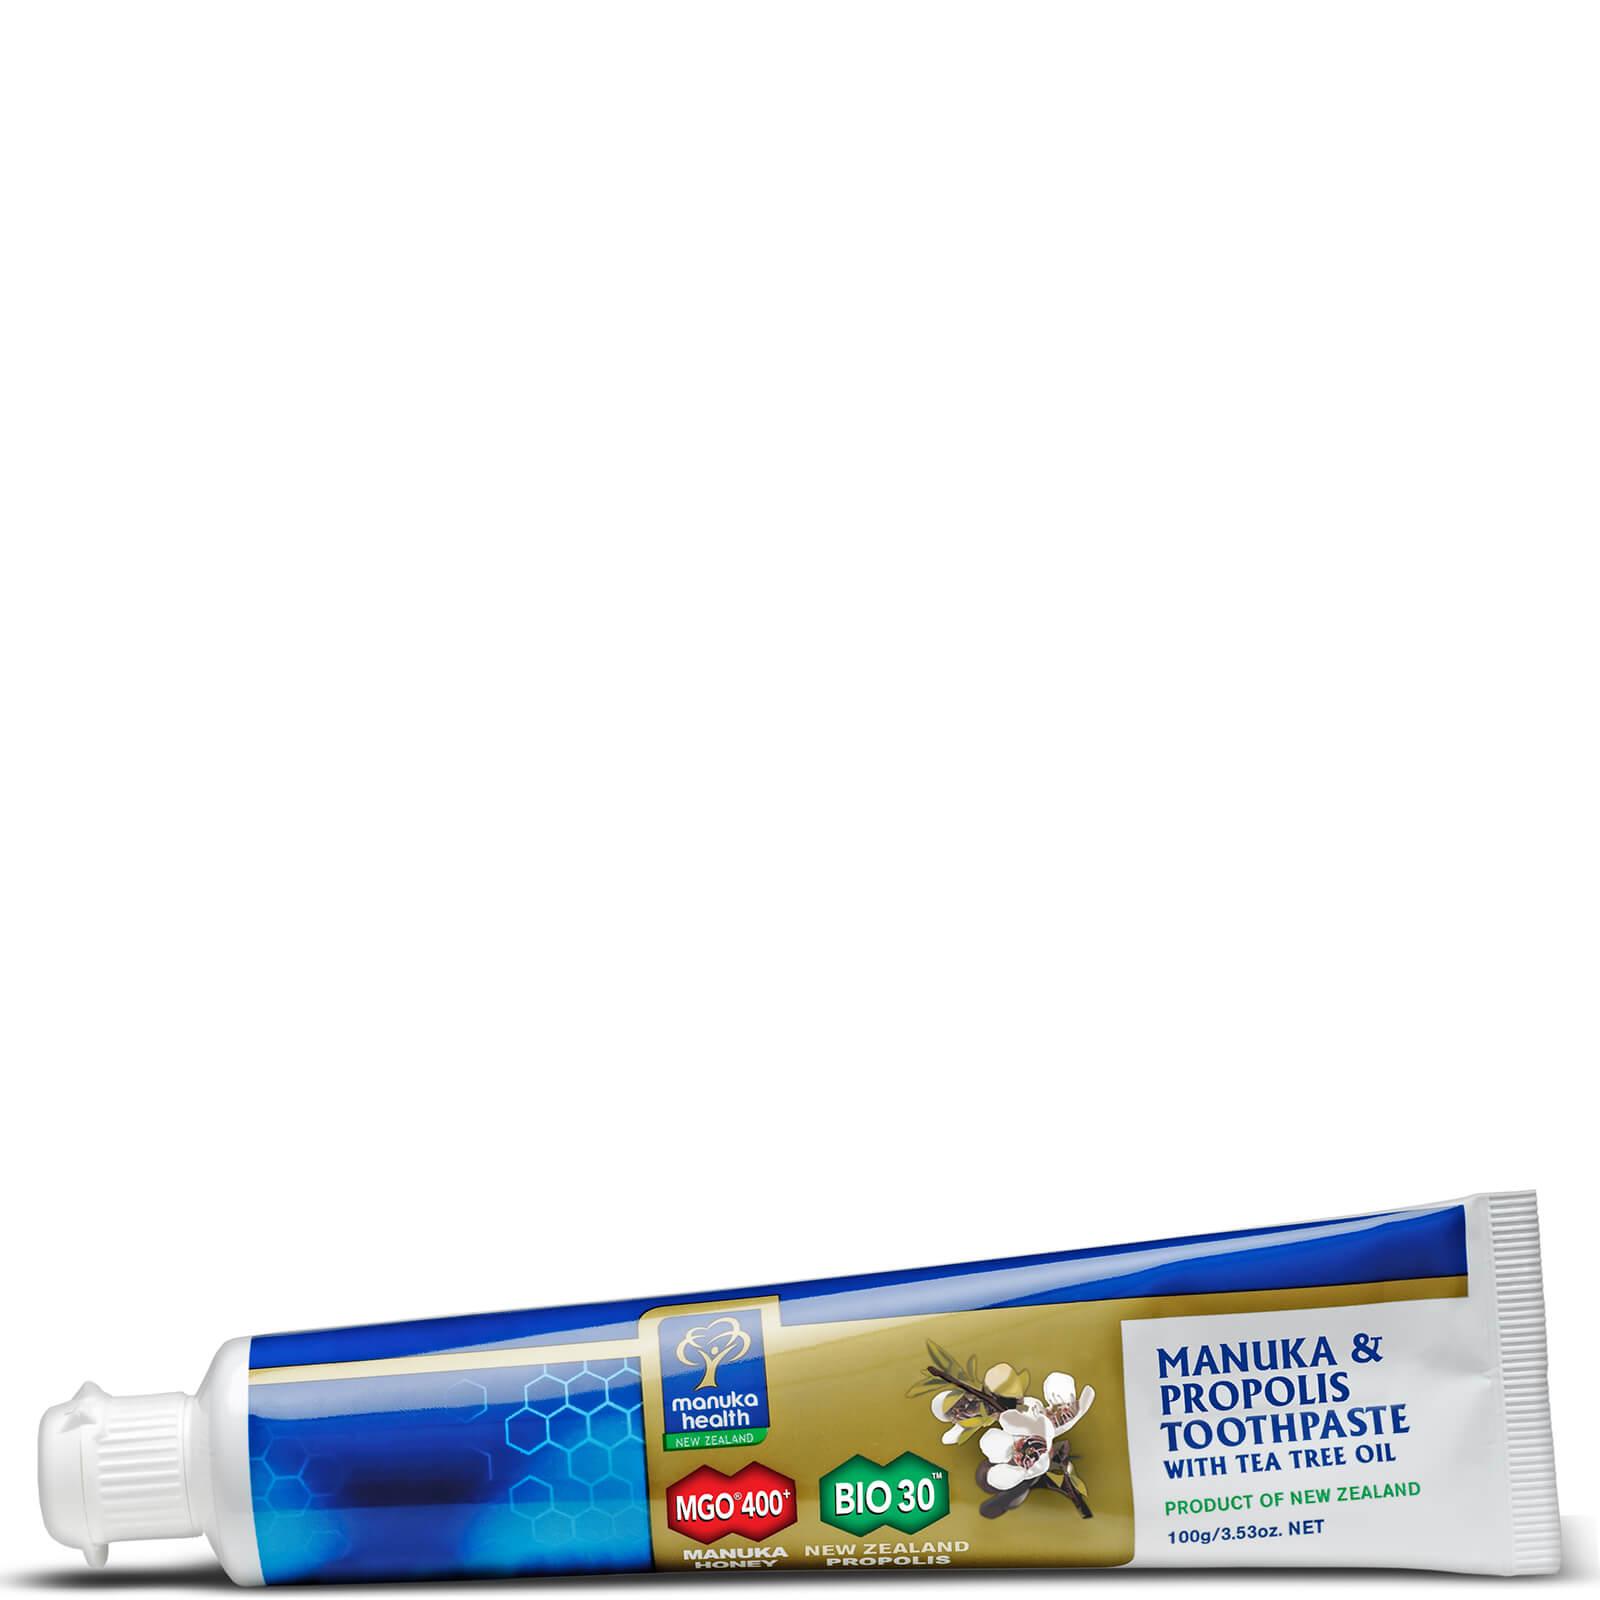 Manuka Health New Zealand Ltd Dentifrice au Miel de Manuka MGO 400+, Huile d'Arbre à Thé et Propolis Manuka Health 100 g